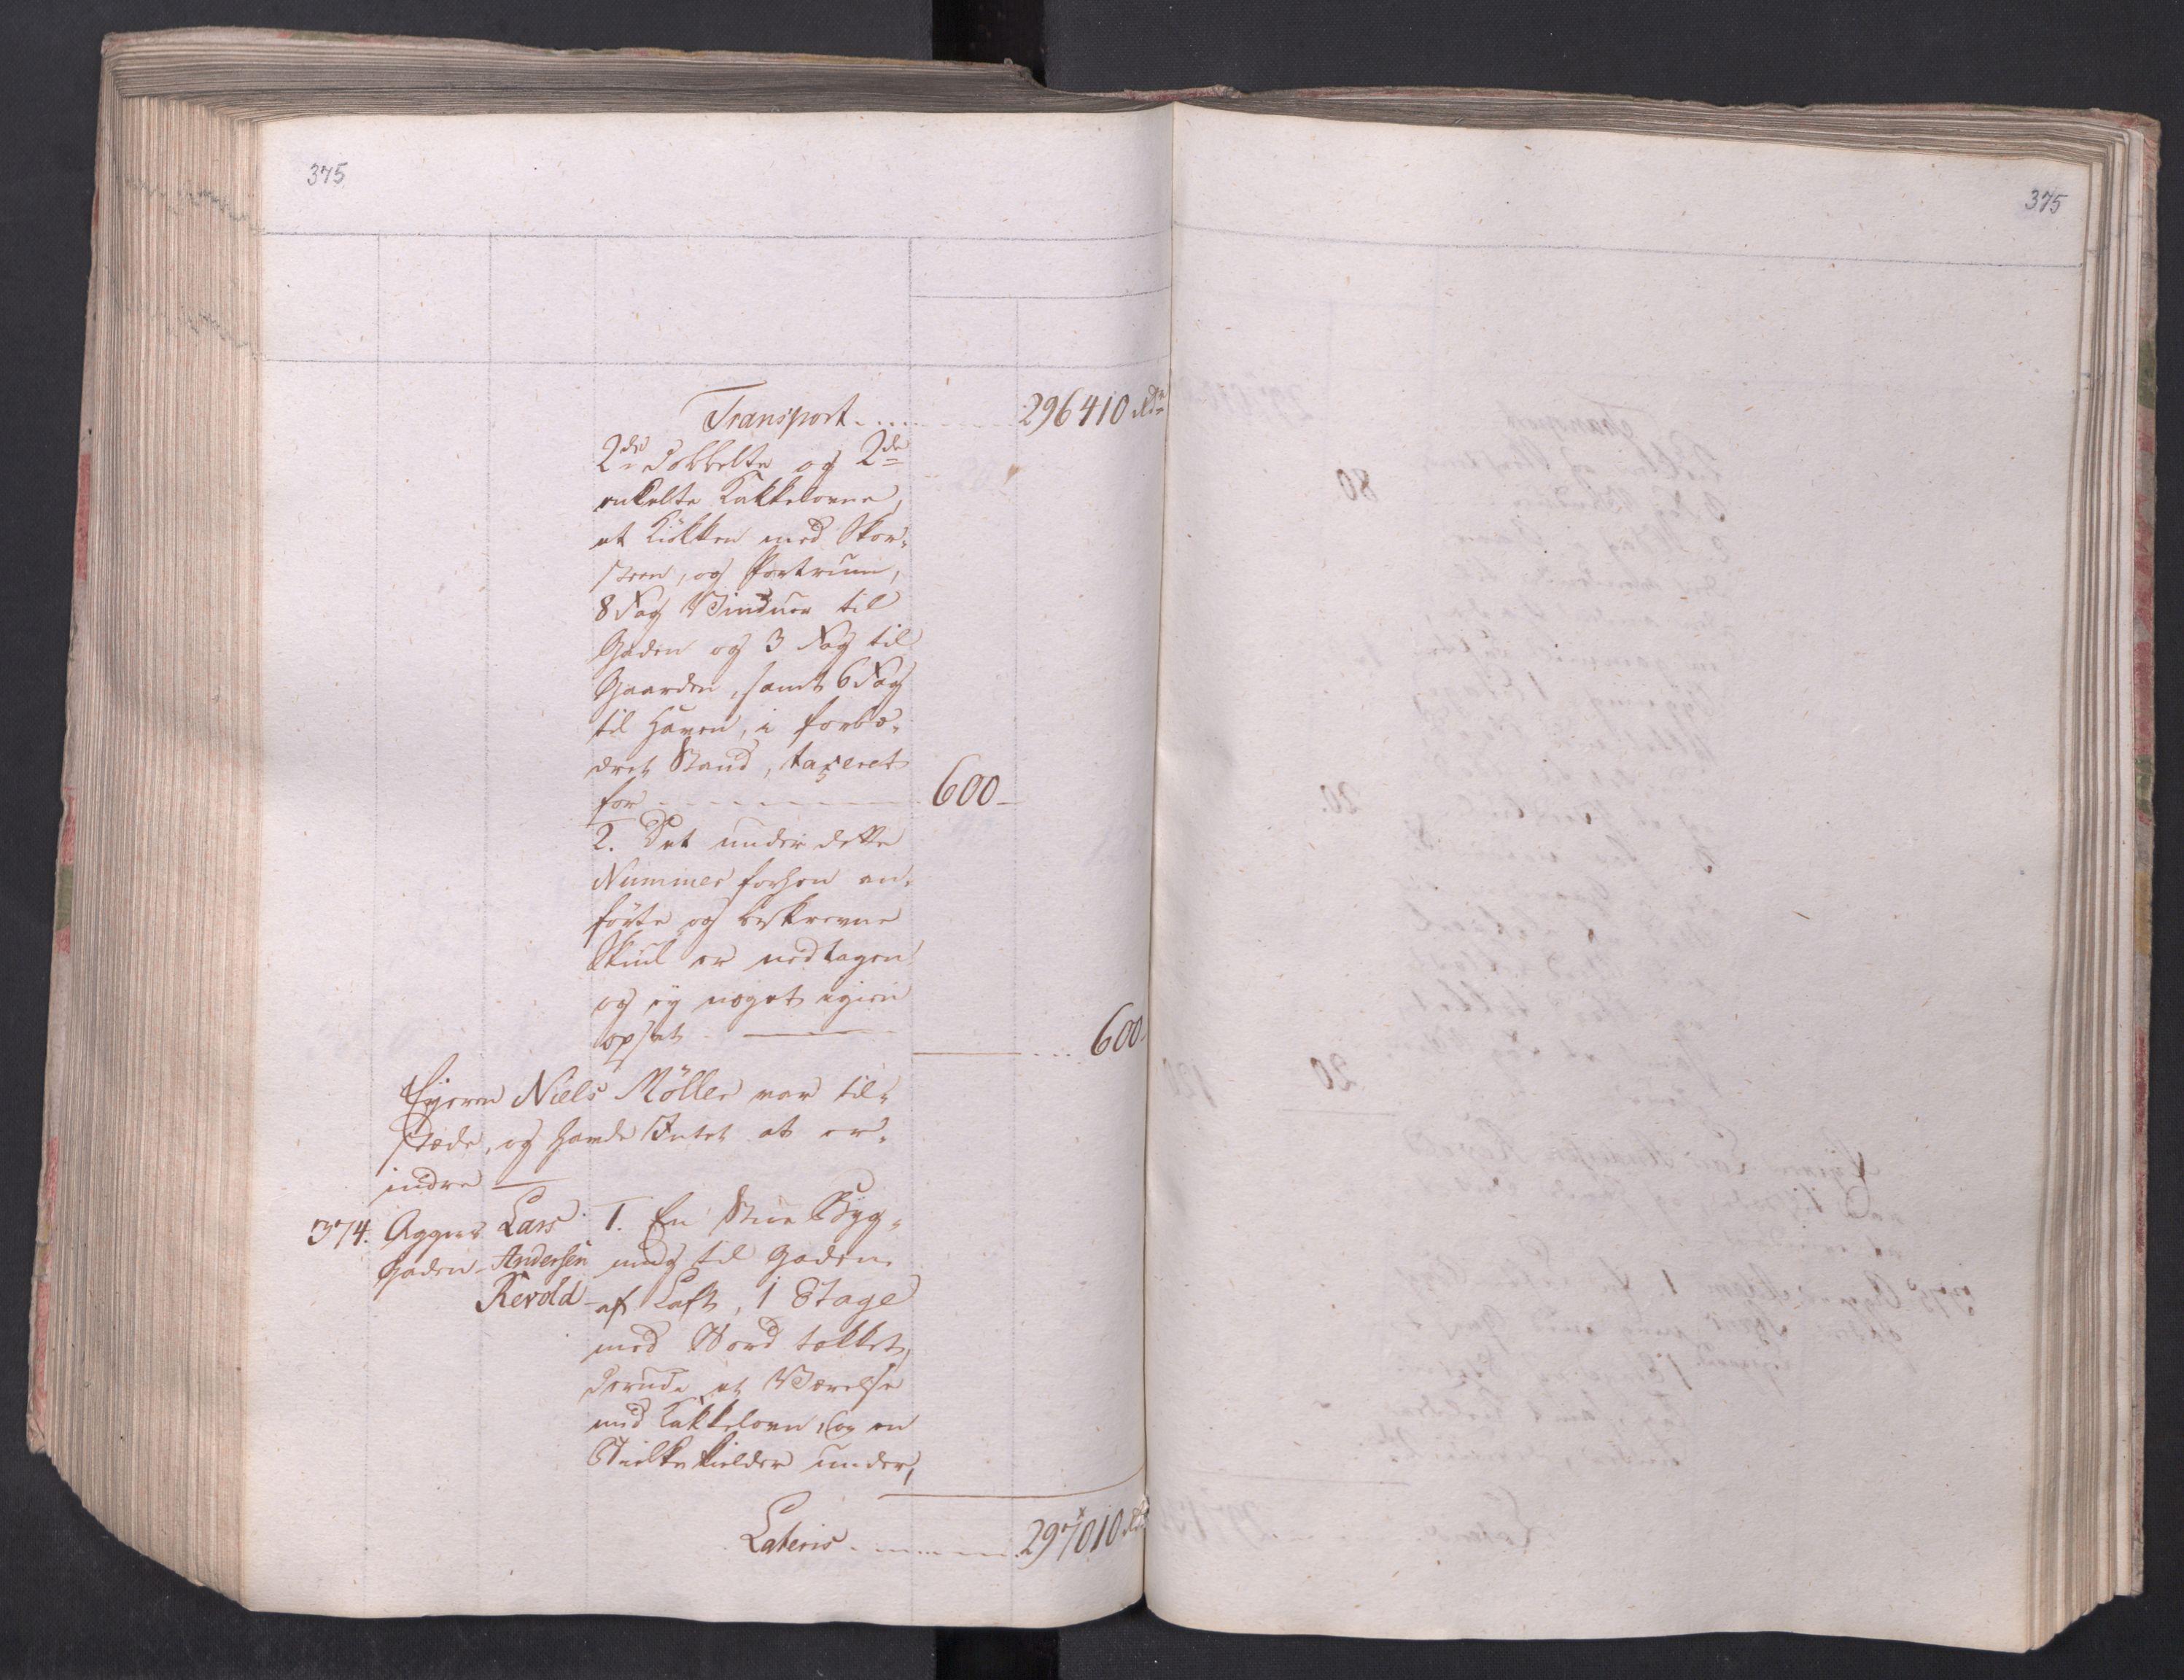 SAO, Kristiania stiftamt, I/Ia/L0015: Branntakster, 1797, s. 375